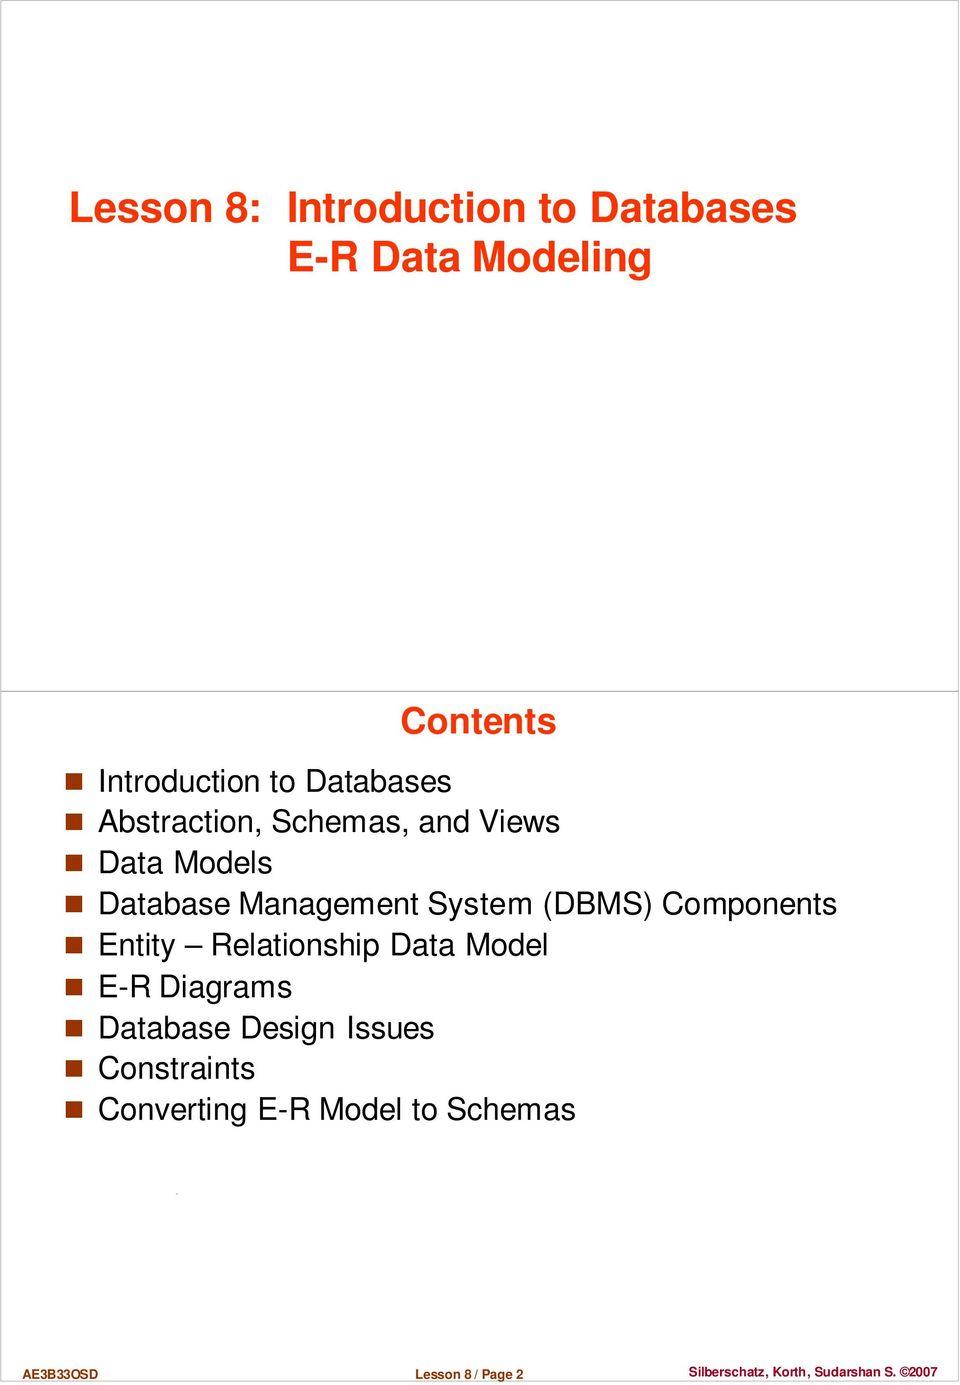 Lesson 8: Introduction To Databases E-R Data Modeling - Pdf for Er Diagram Korth